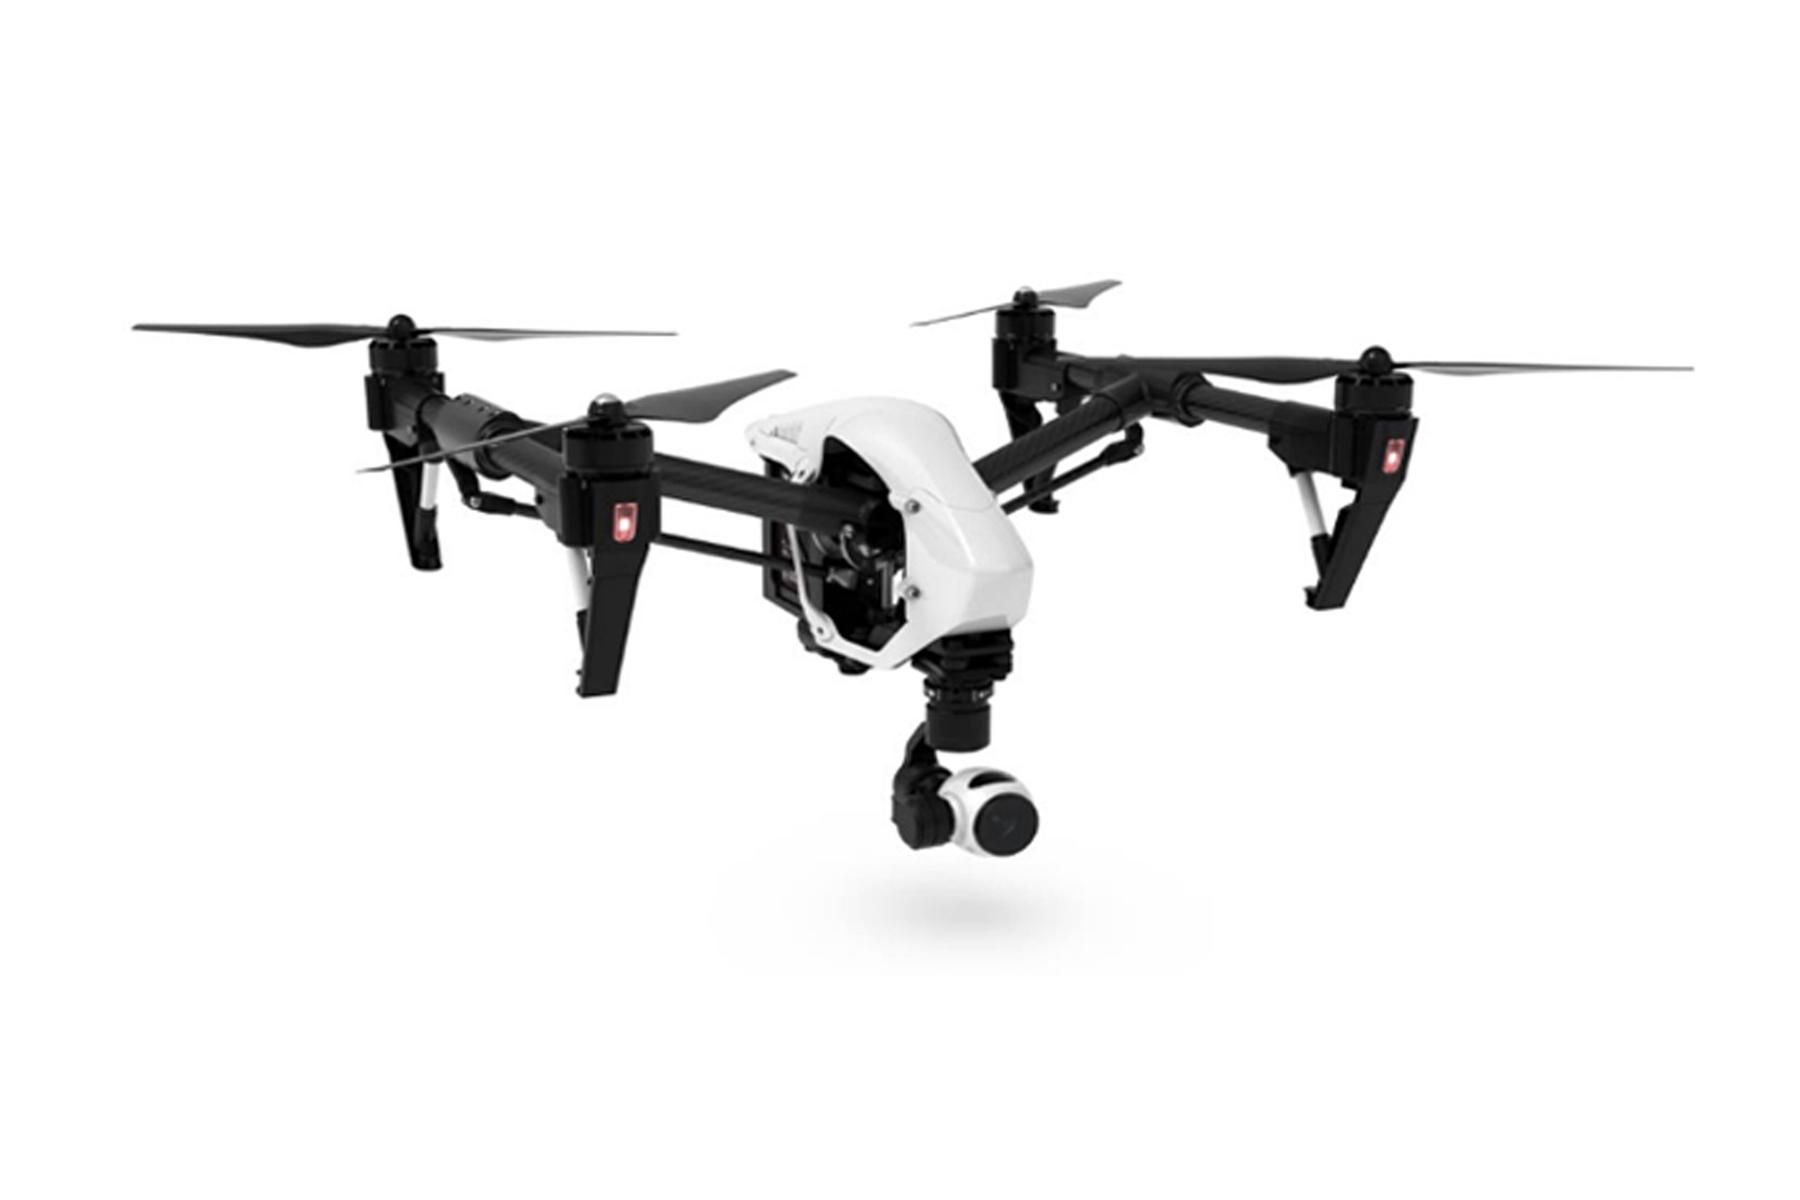 Dji inspire 1 avec 2 radios dji t600 2 dronelec - Temperature ambiante ideale ...